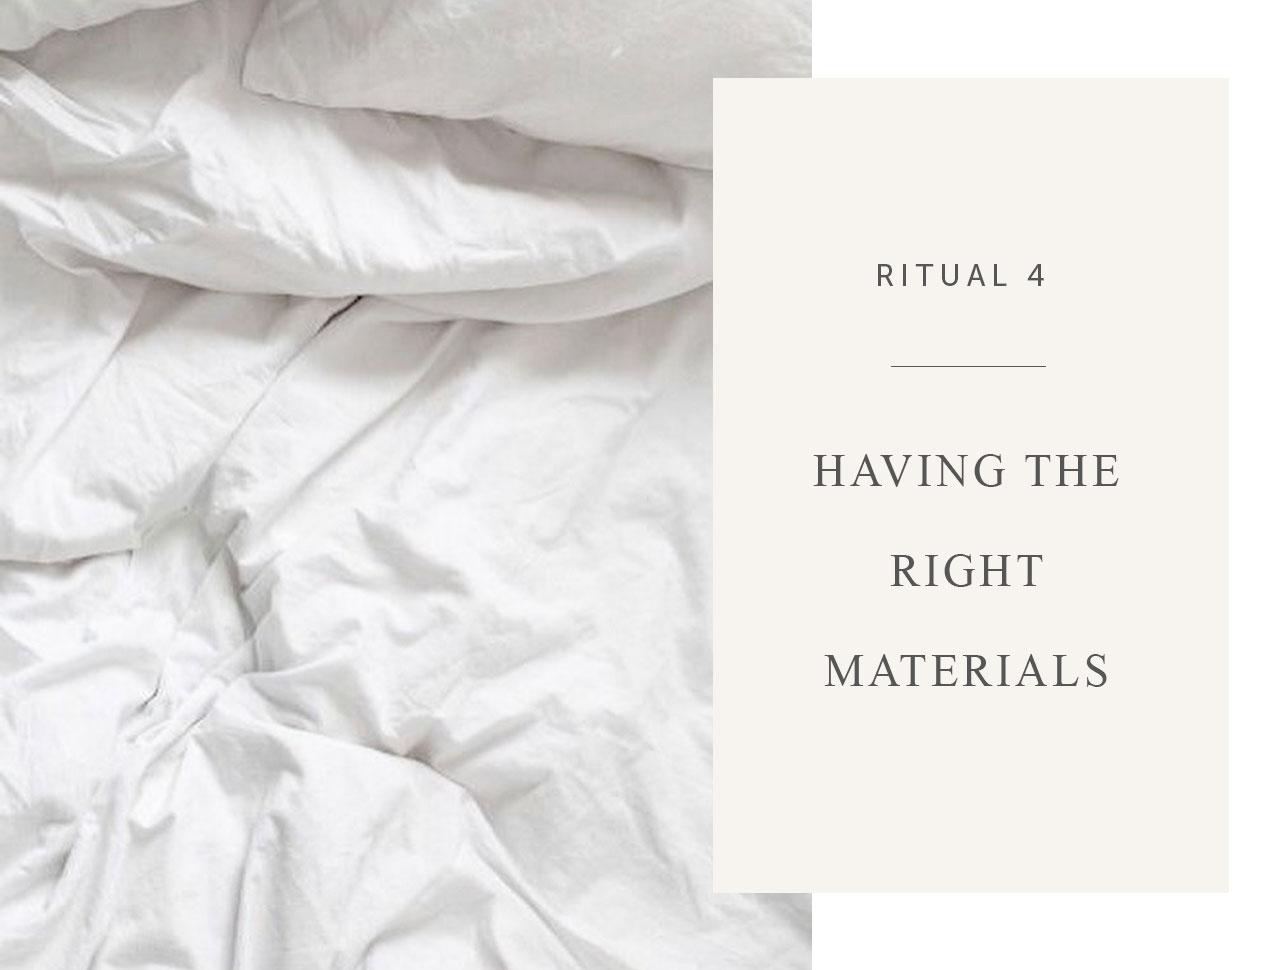 Bedtime ritual 4